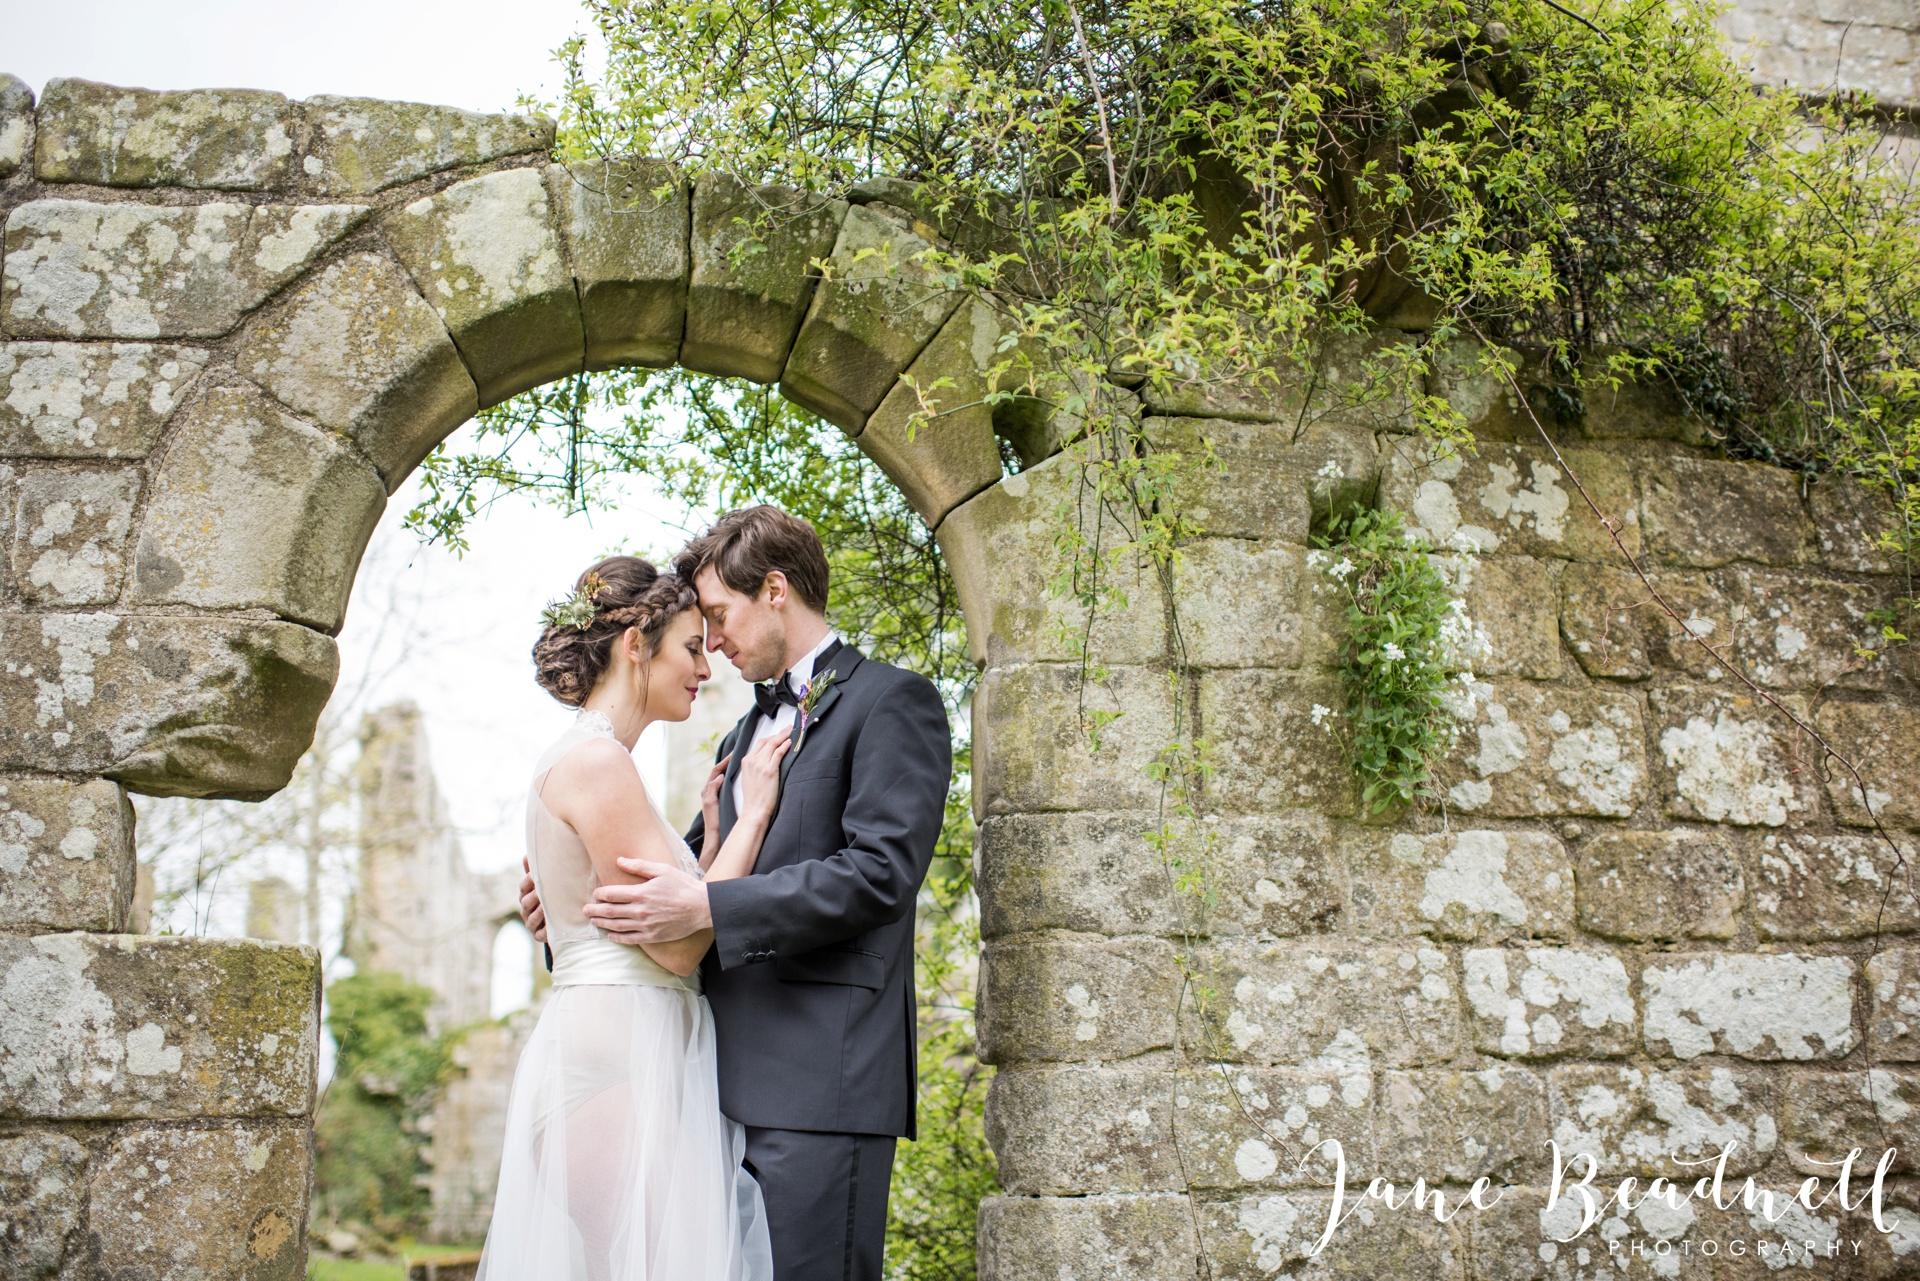 Jervaulx Abbey wedding photography fine art Yorkshire wedding photographer jane beadnell_0042